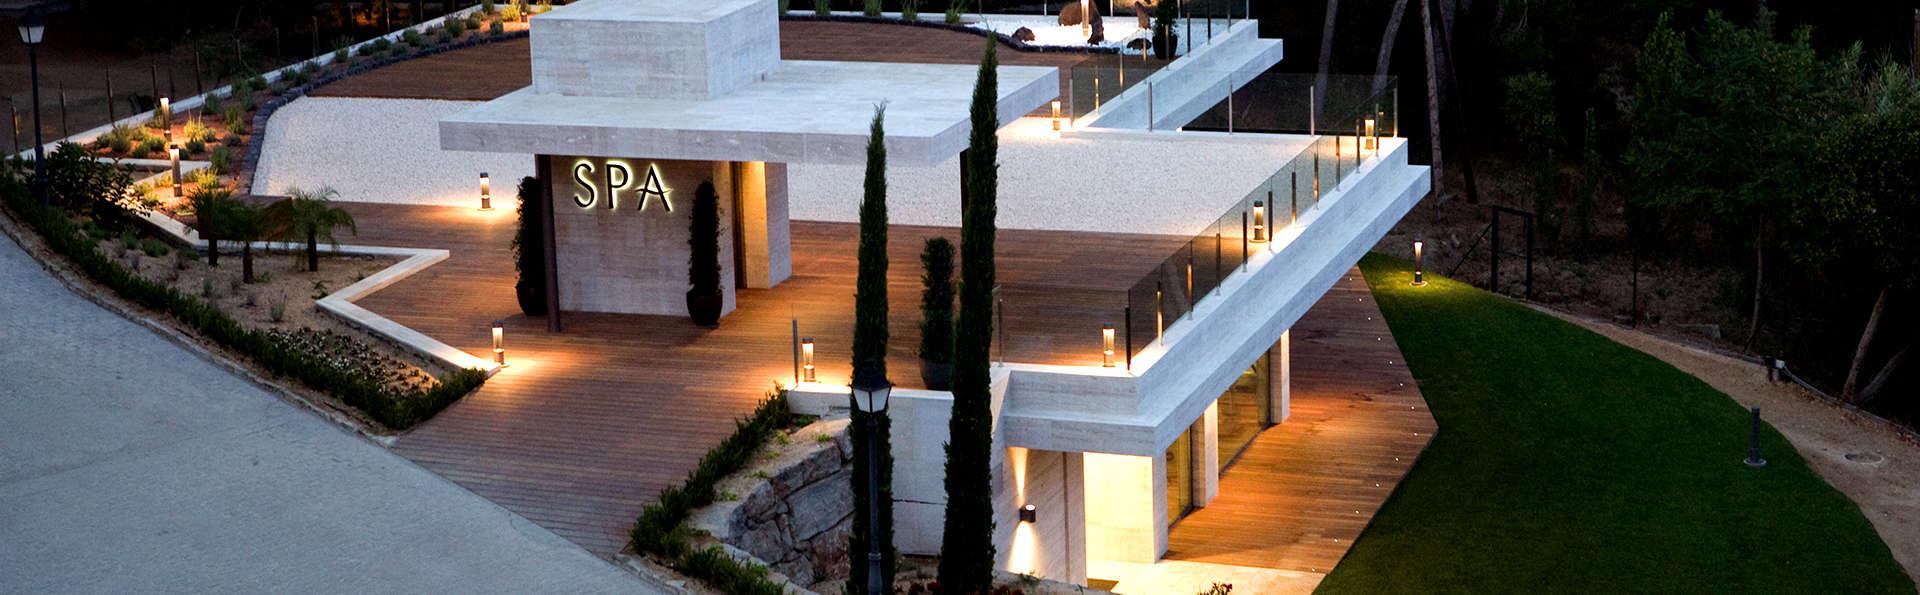 Hotel Santa Marta - EDIT_N2_FRONT2.jpg